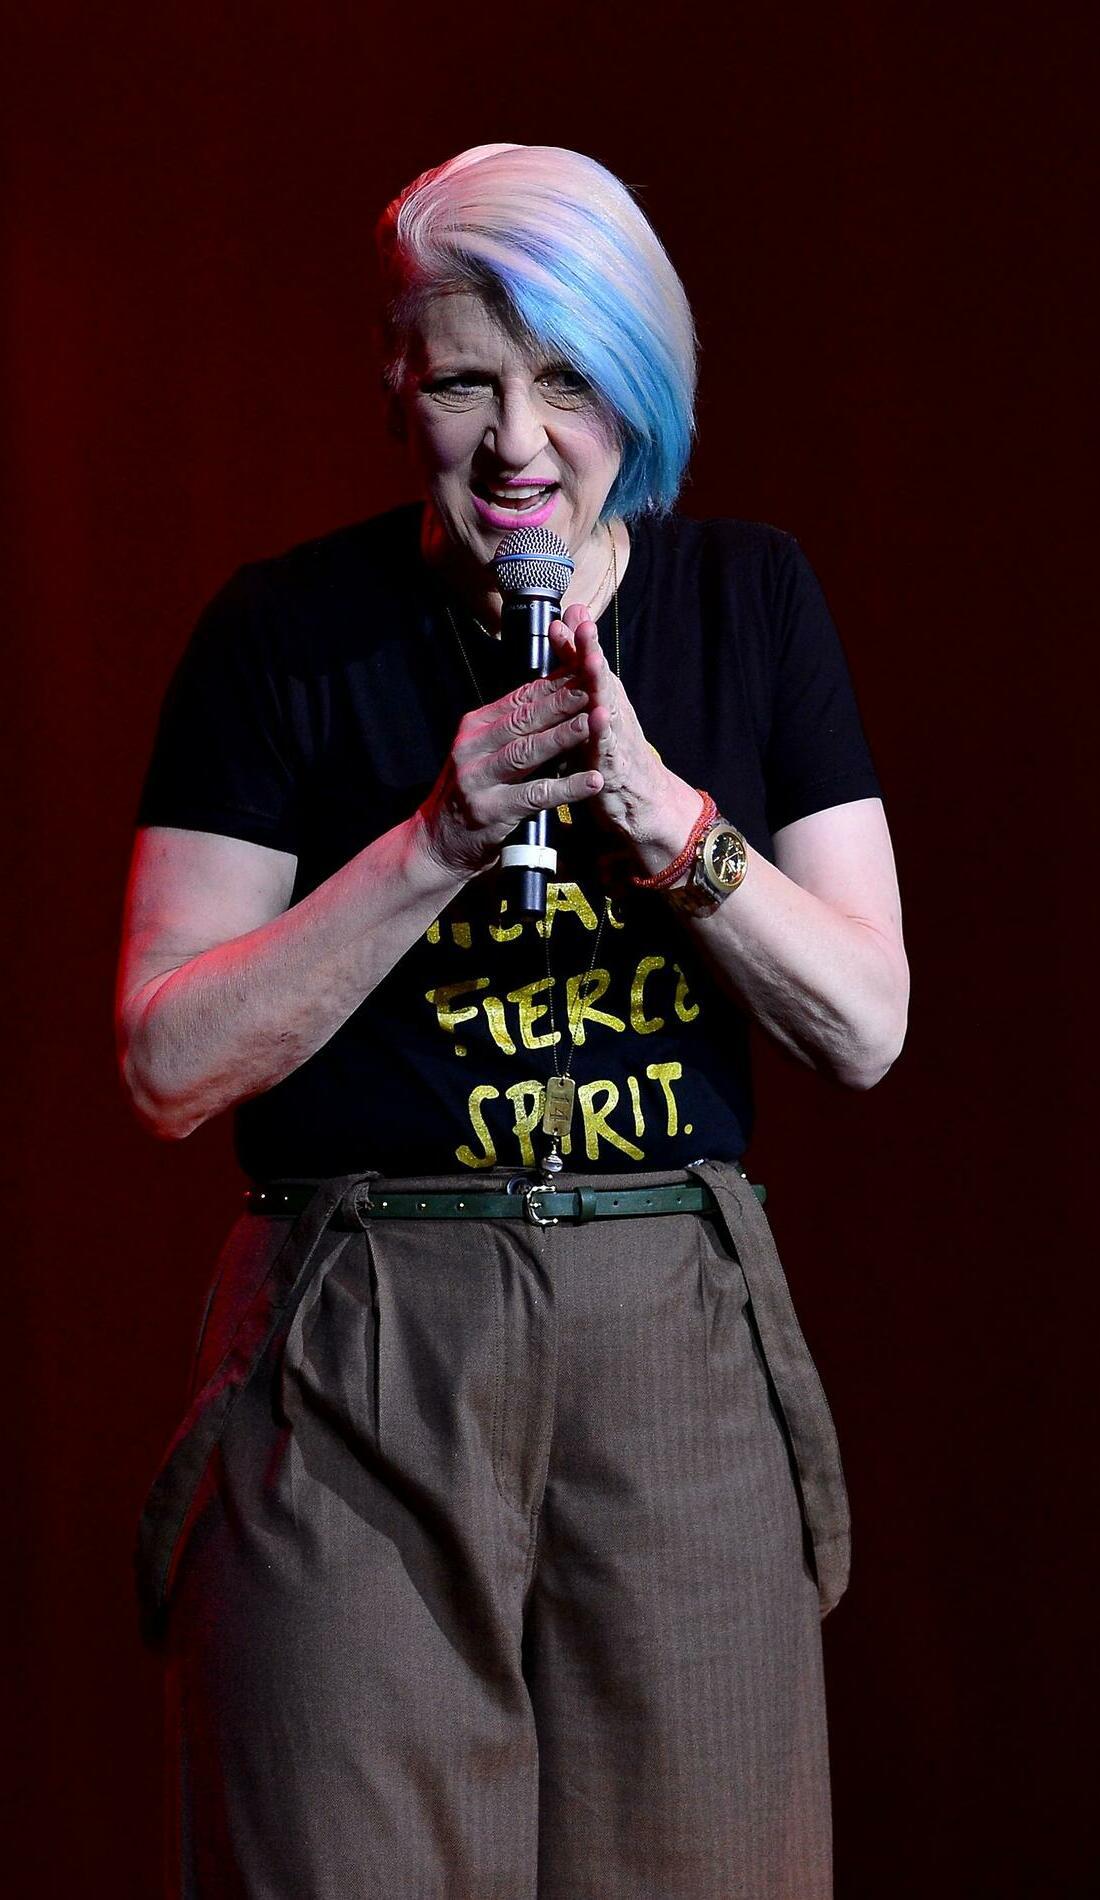 A Lisa Lampanelli live event